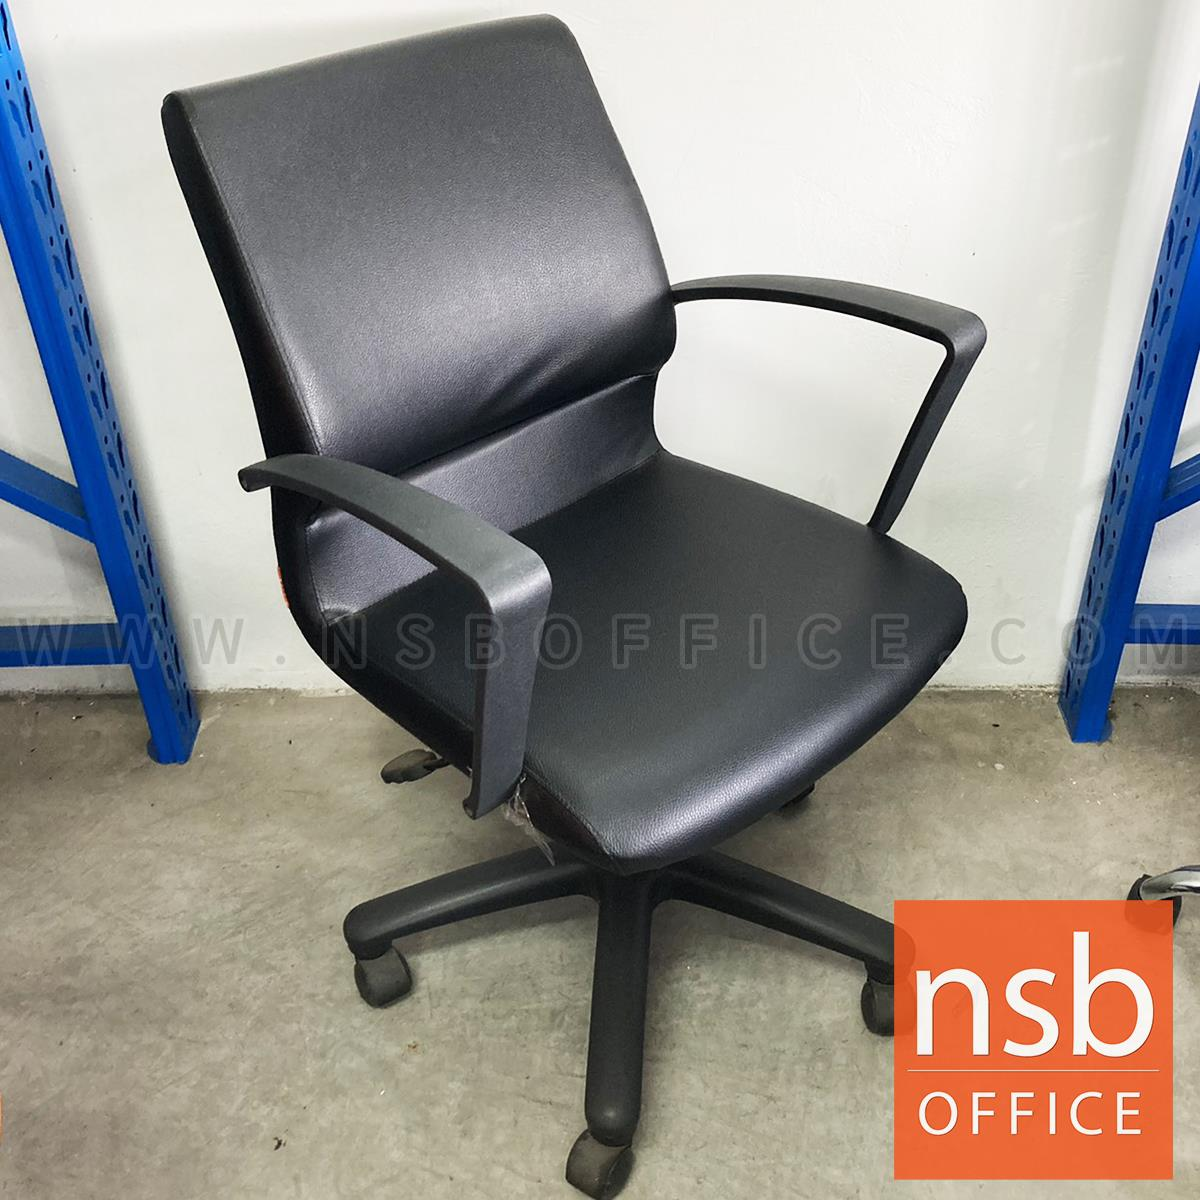 L02A375:เก้าอี้สำนักงาน   โช๊คแก๊ส มีก้อนโยก ขาพลาสติก